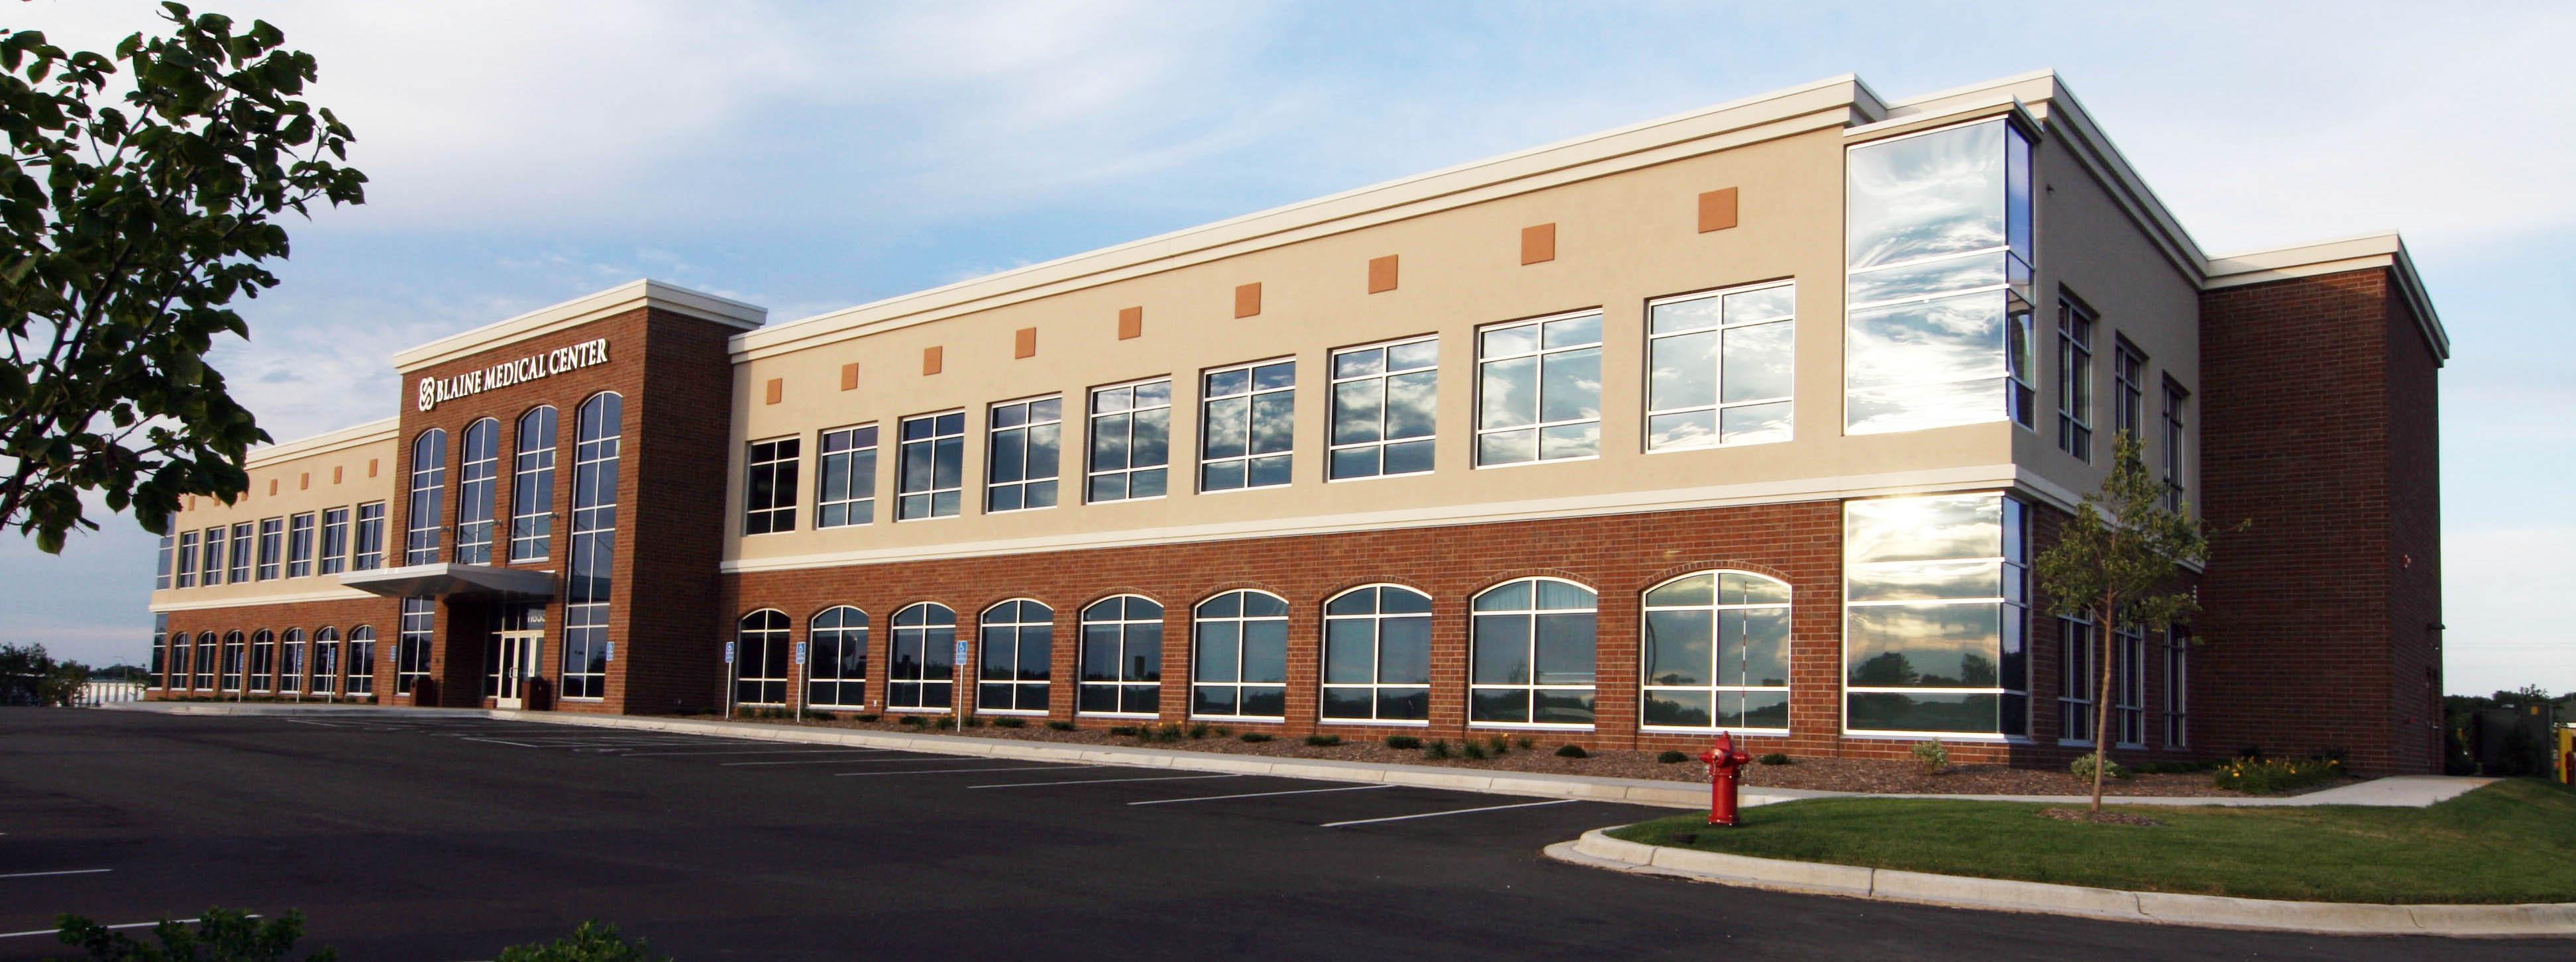 Premier_Commercial_Properties_Blaine_Medical_Center